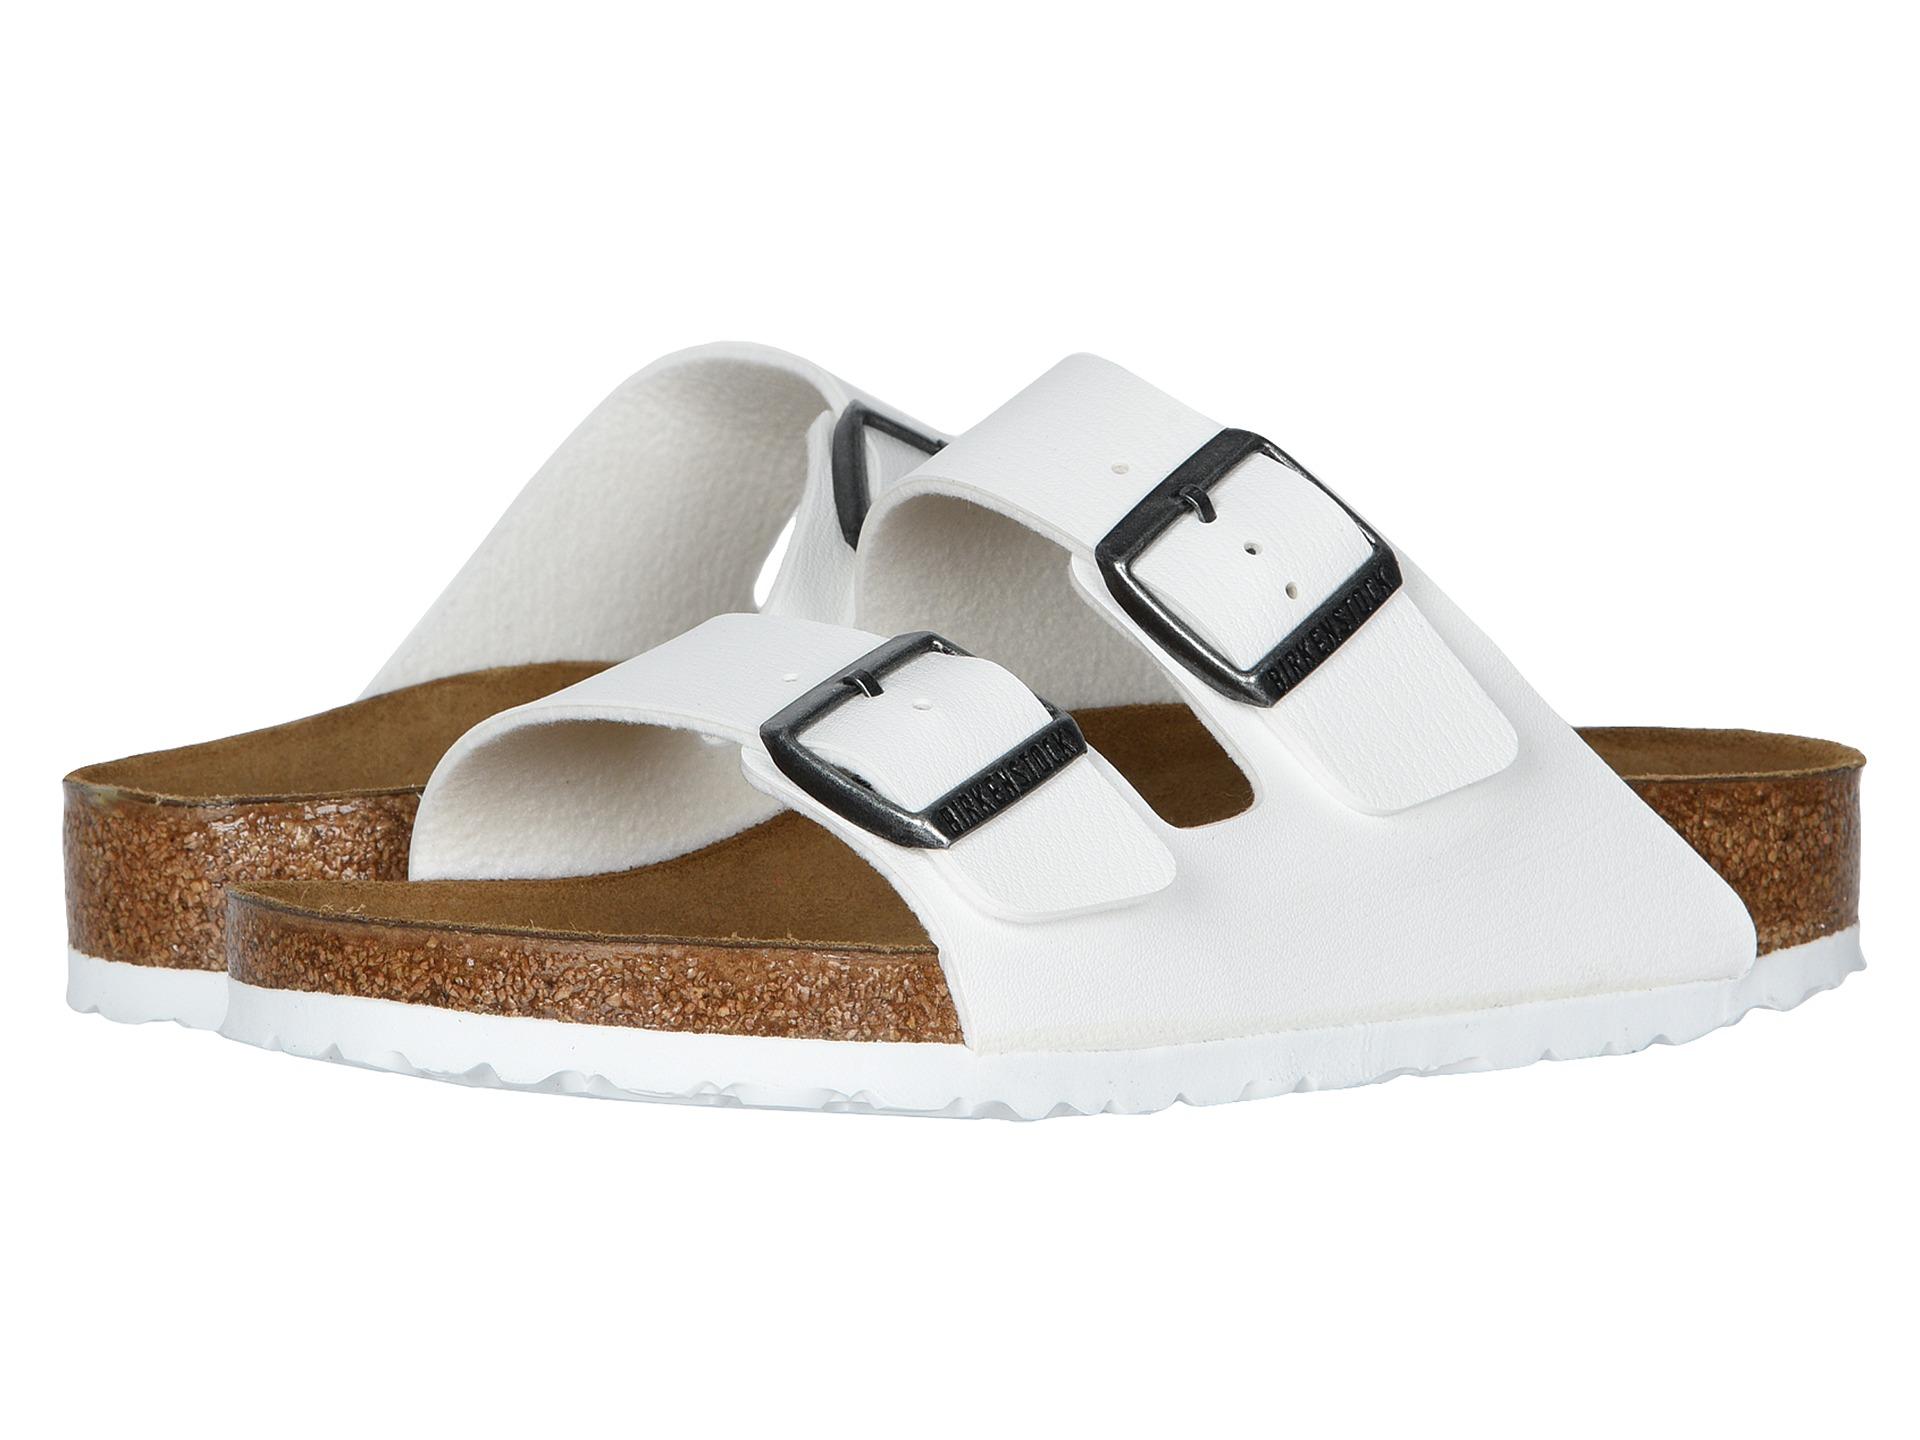 Sandales Birkenstock Bouclées - Blanc 3M3eutKVZt